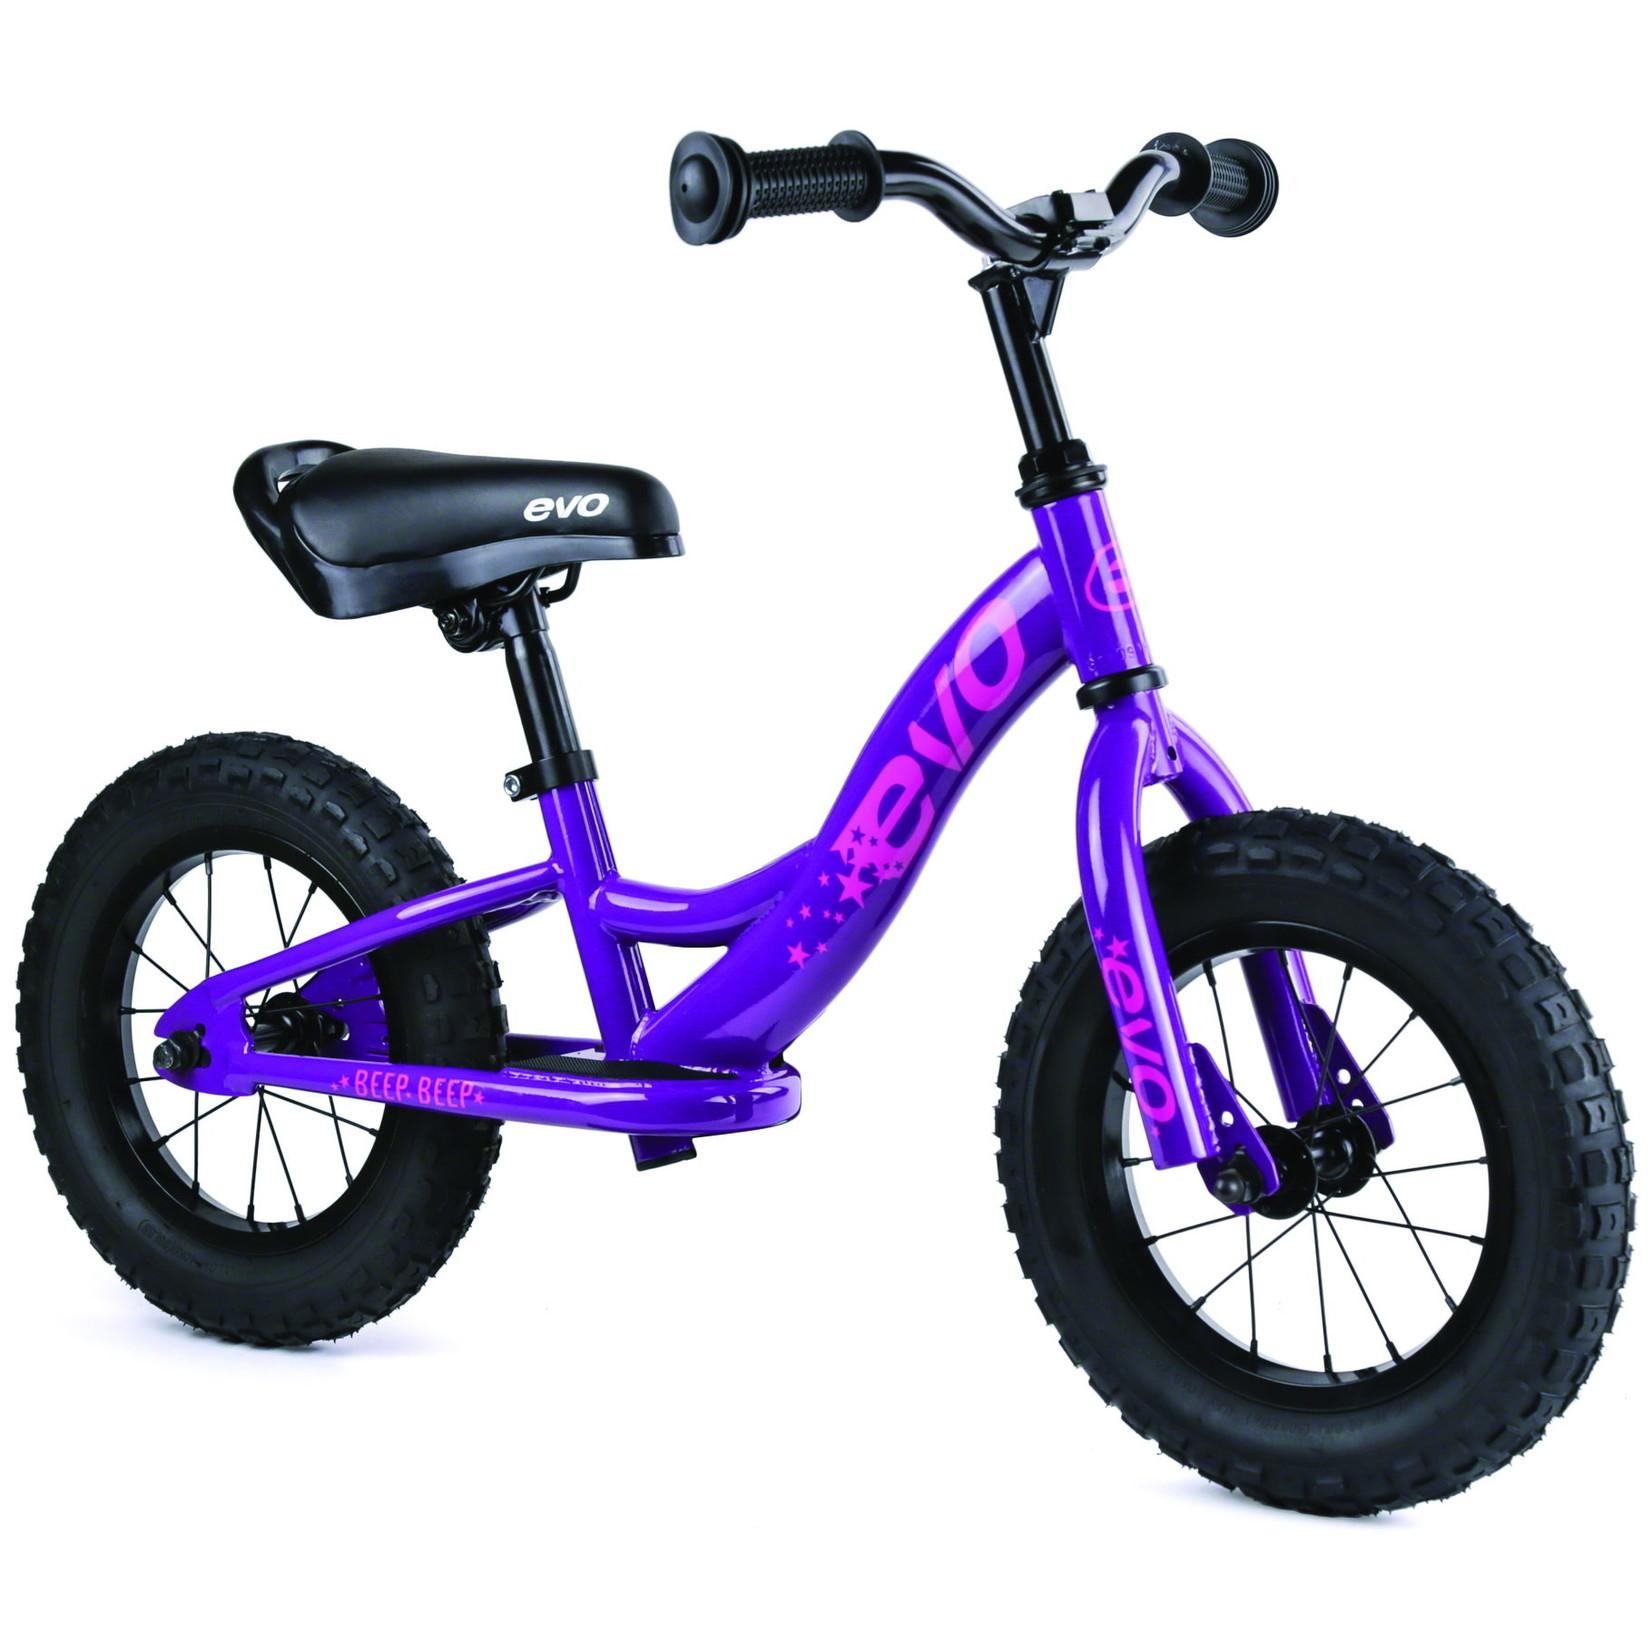 Evo Evo Balance Bike, Beep Beep, Purpling Pur, Kids